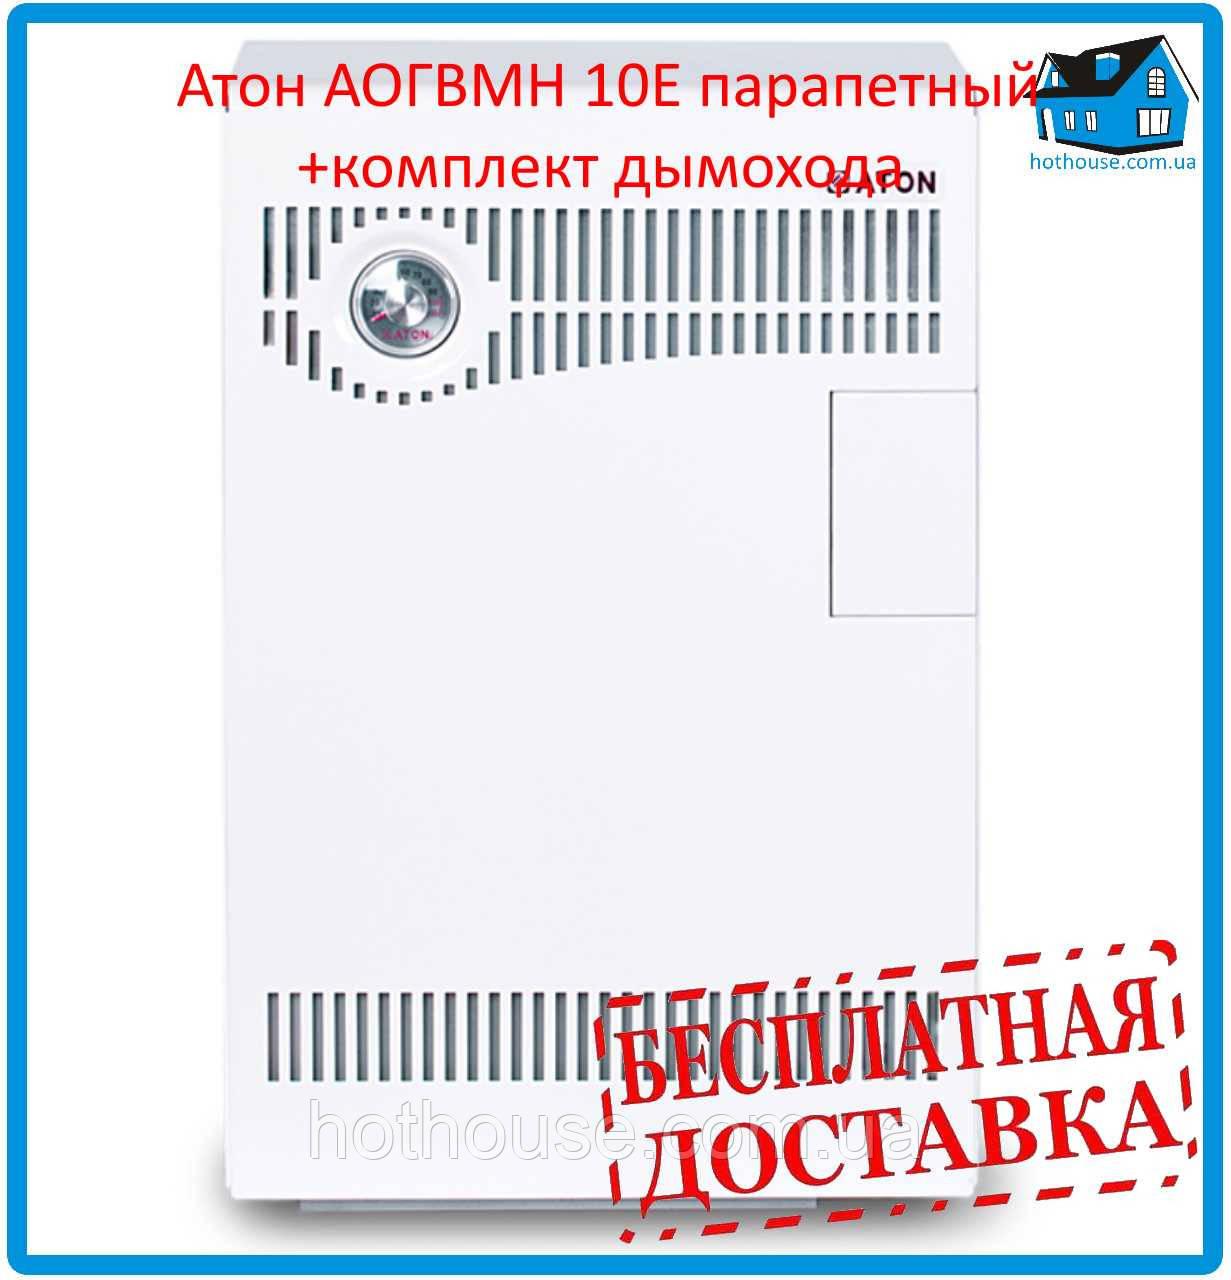 Котел газовый парапетный Атон АОГВМНД 10Е + труба